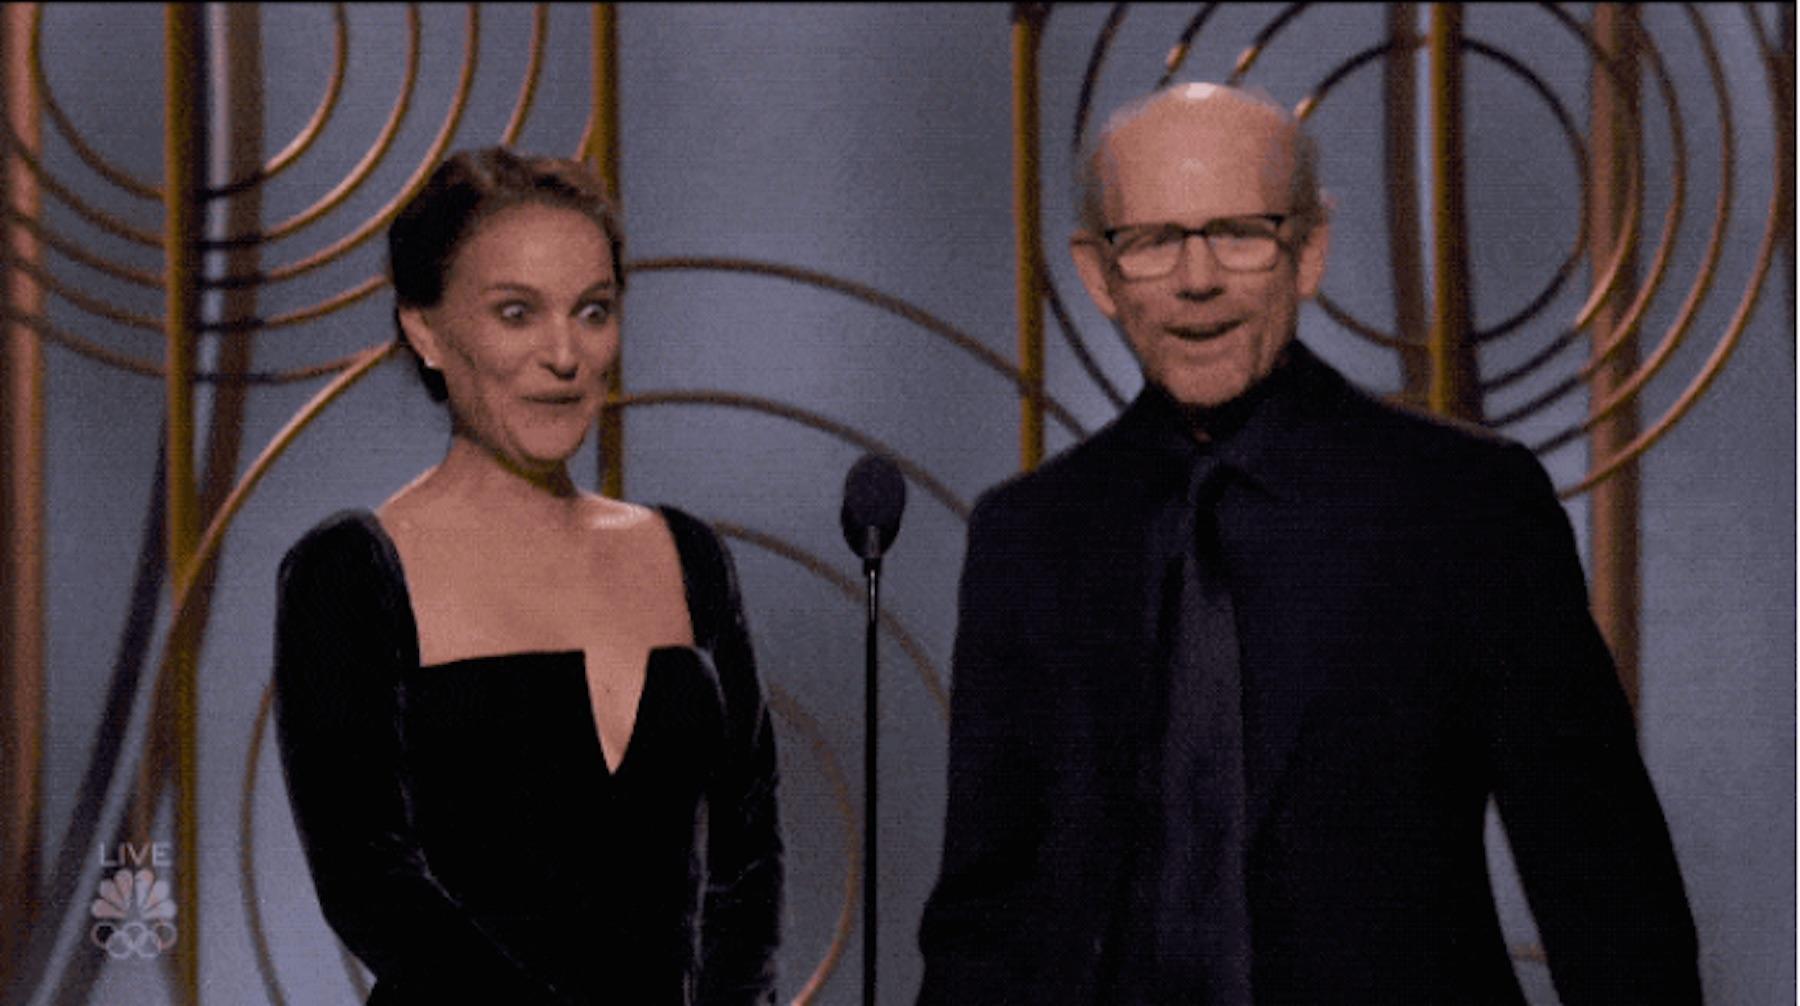 Natalie Portman and Ron Howard